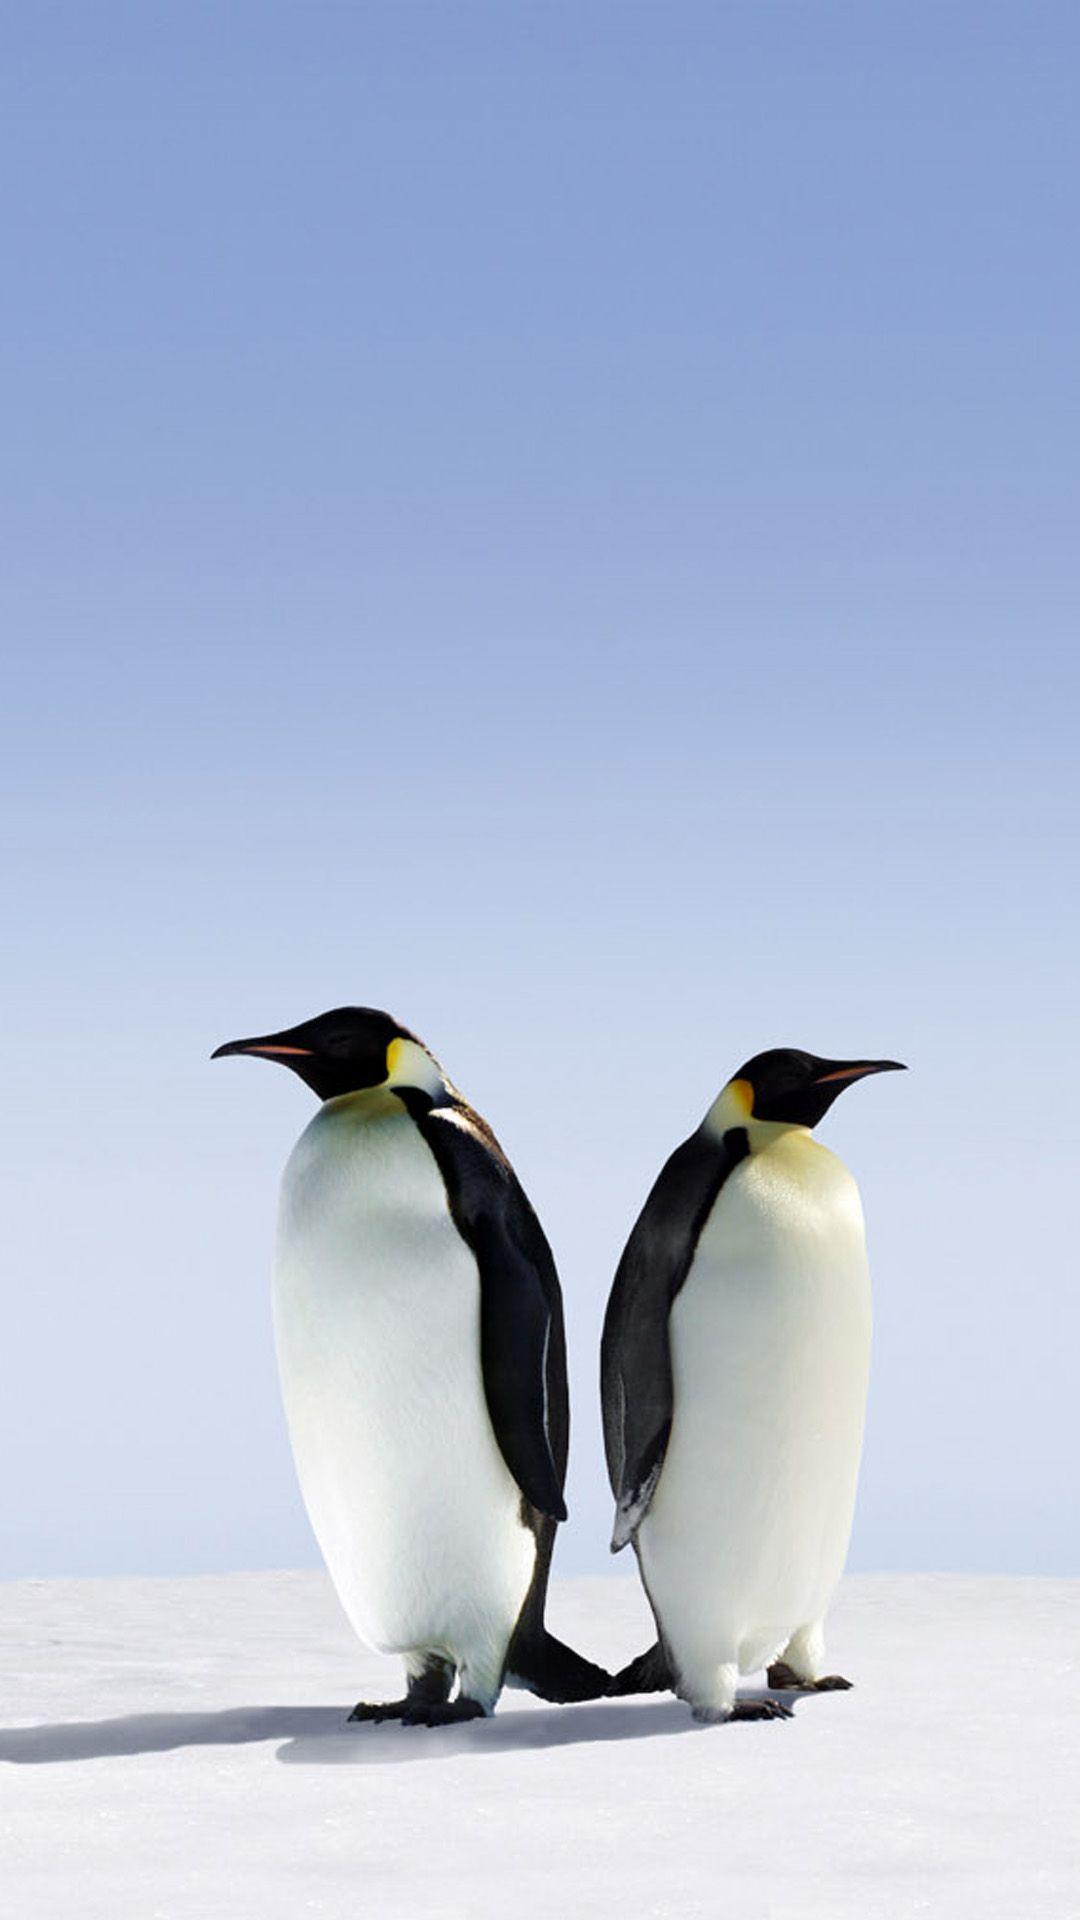 Cute Penguin iPhone Wallpapers   Top Cute Penguin iPhone 1080x1920